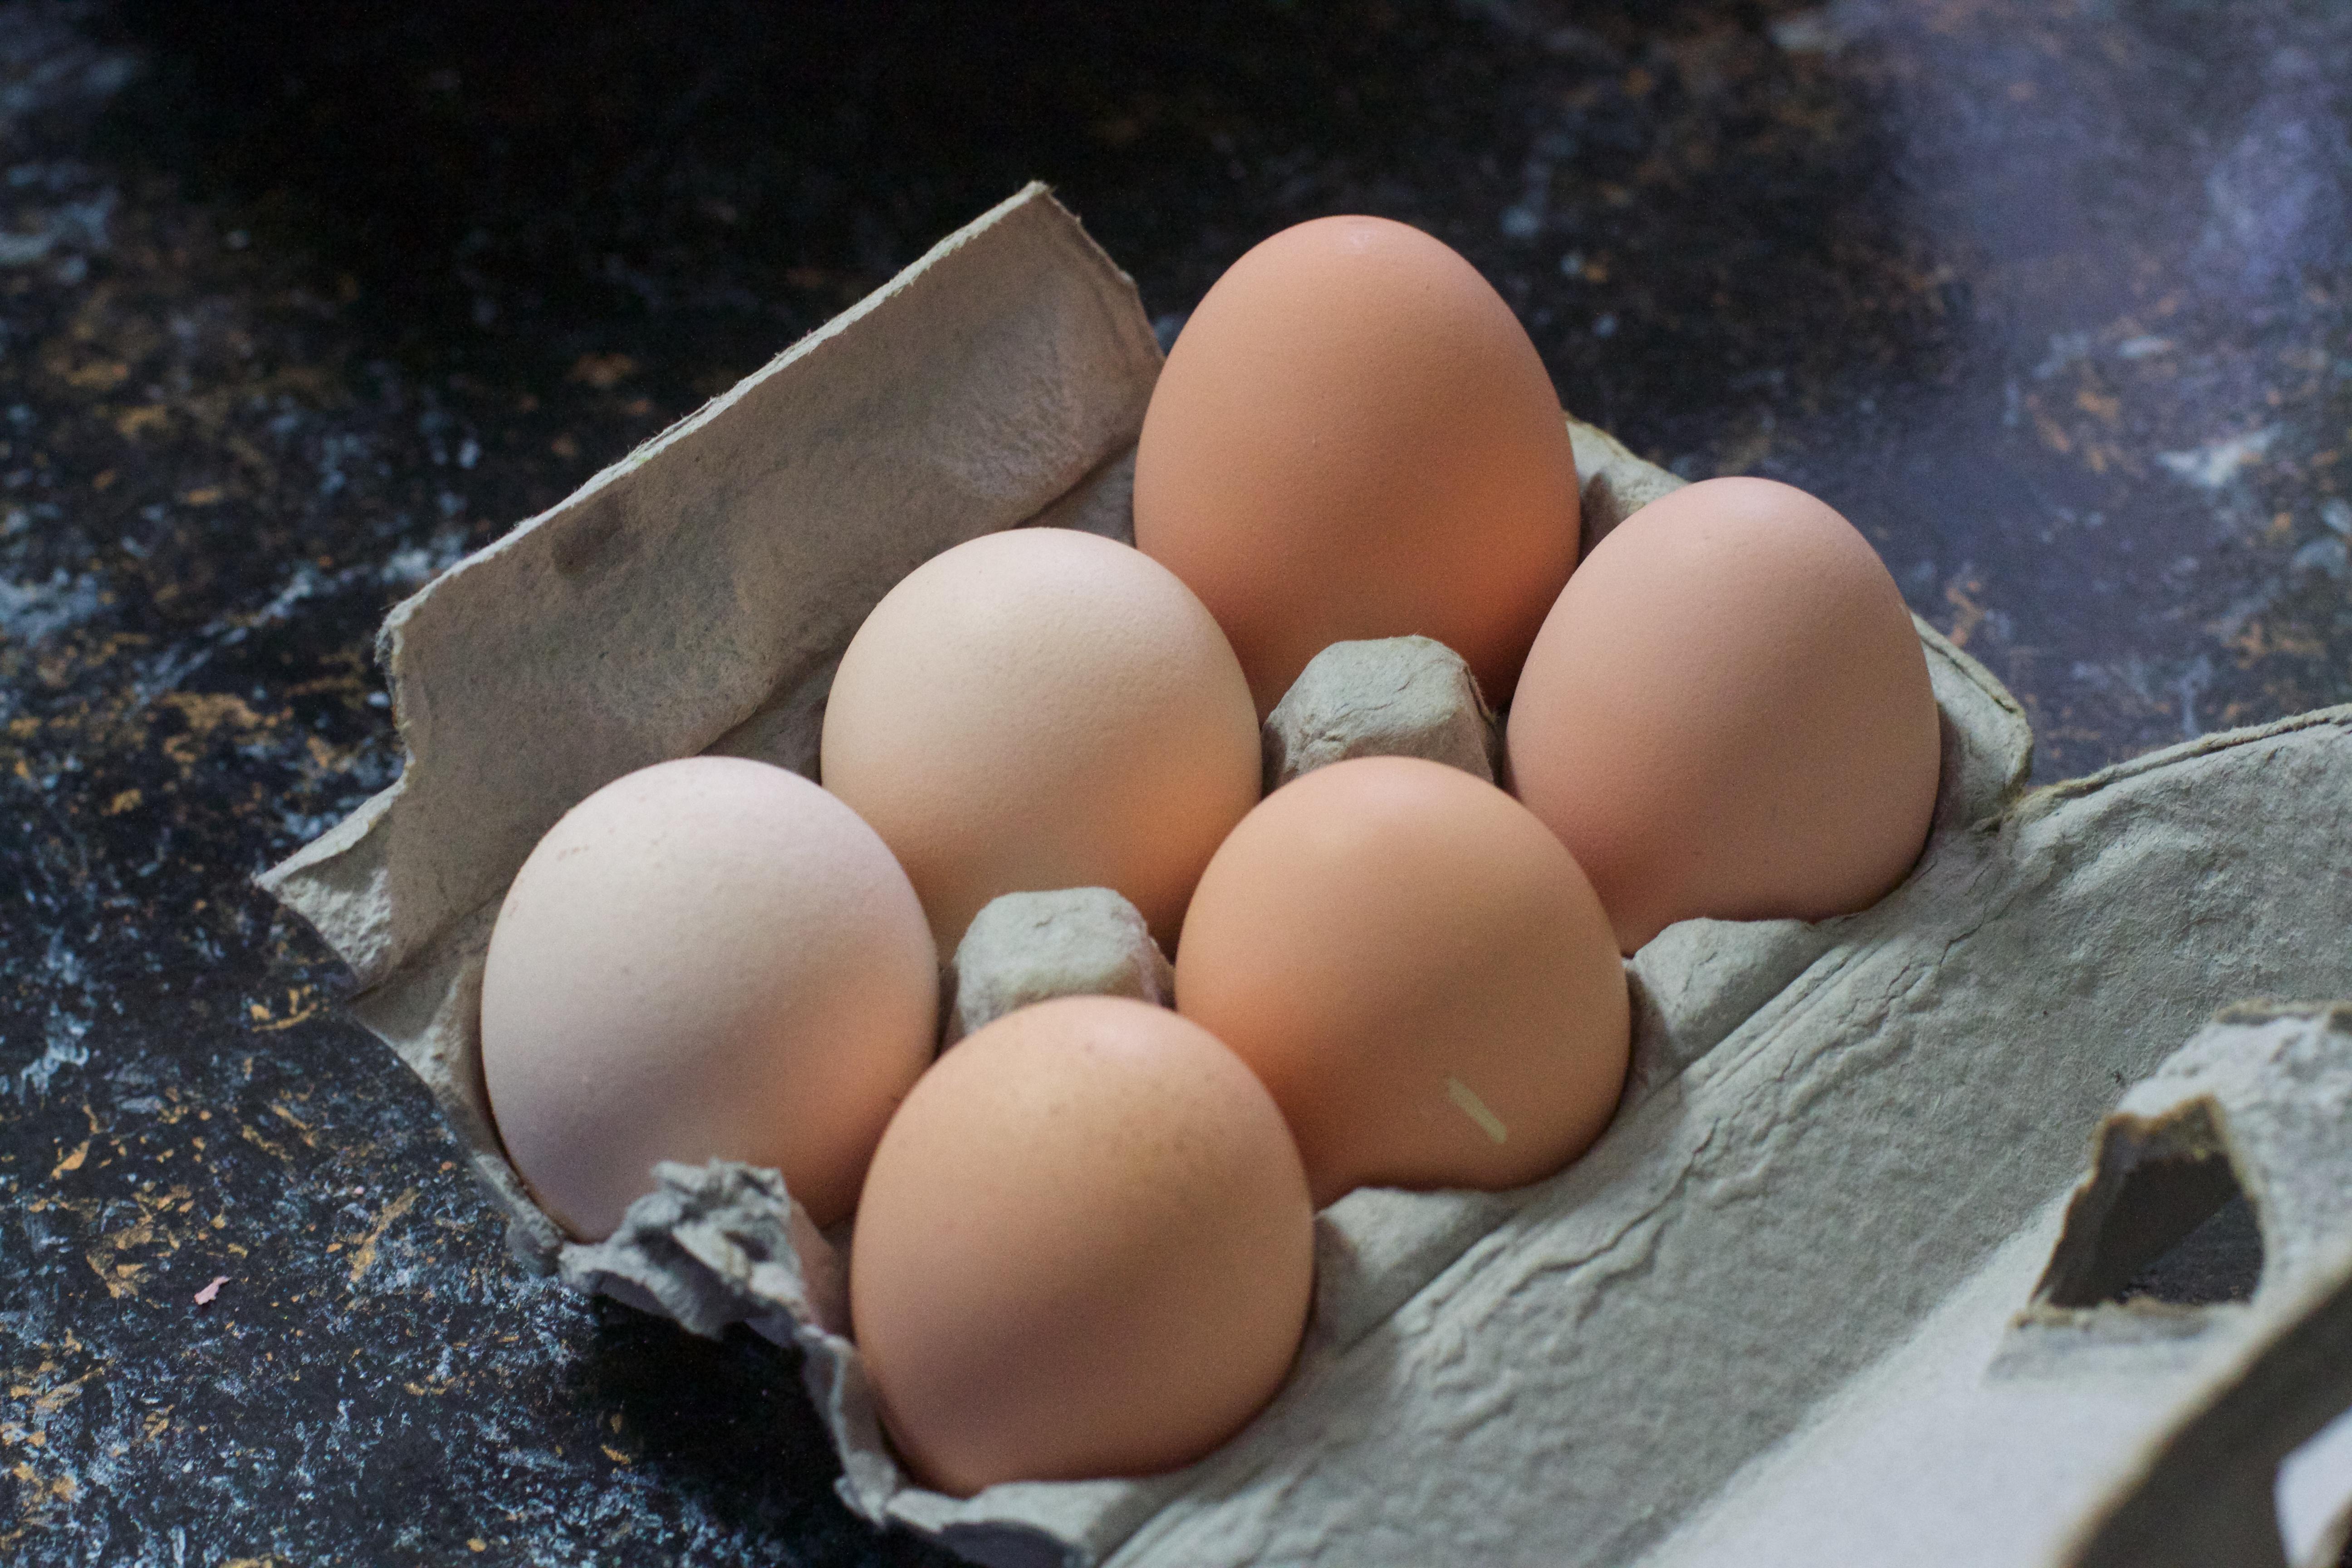 еда яйца графика планеты food eggs graphics planet бесплатно